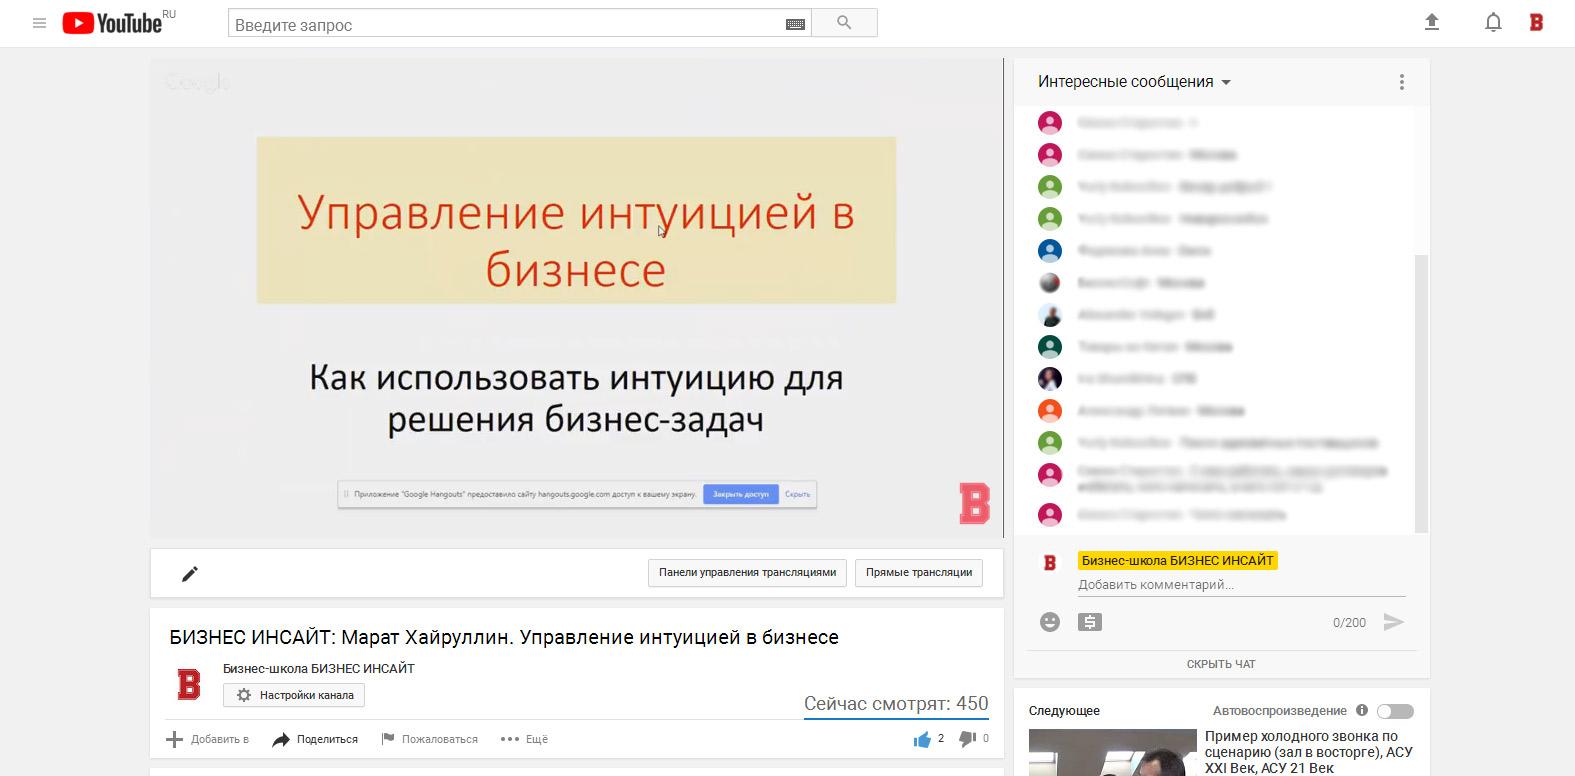 Марат Хайруллин провел открытый (бесплатный) вебинар на площадке БИЗНЕС ИНСАЙТ